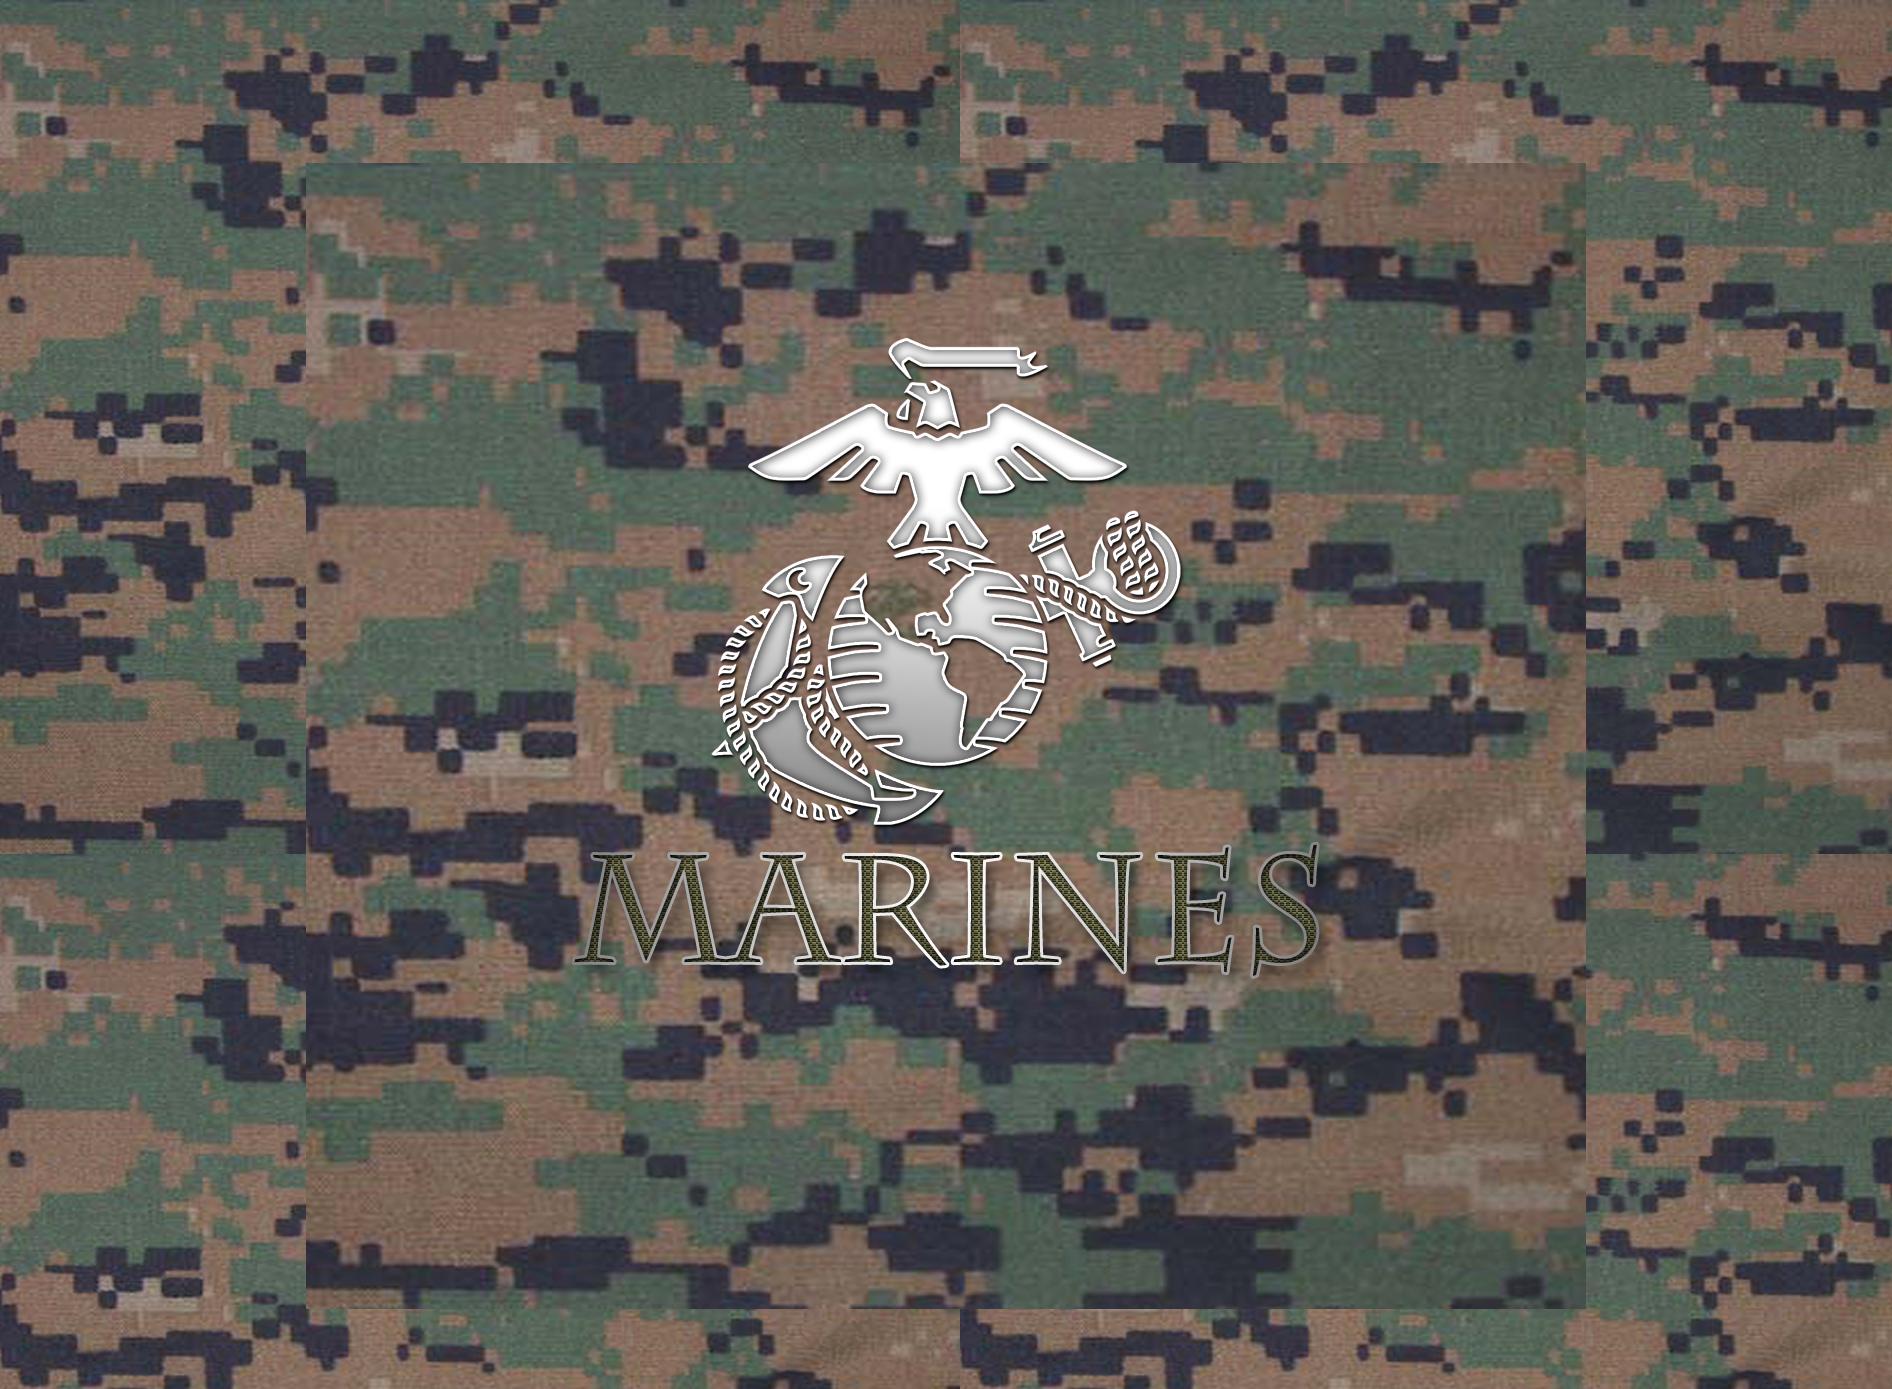 usa marine corps wallpapers hd 1600 1200 1892x1389